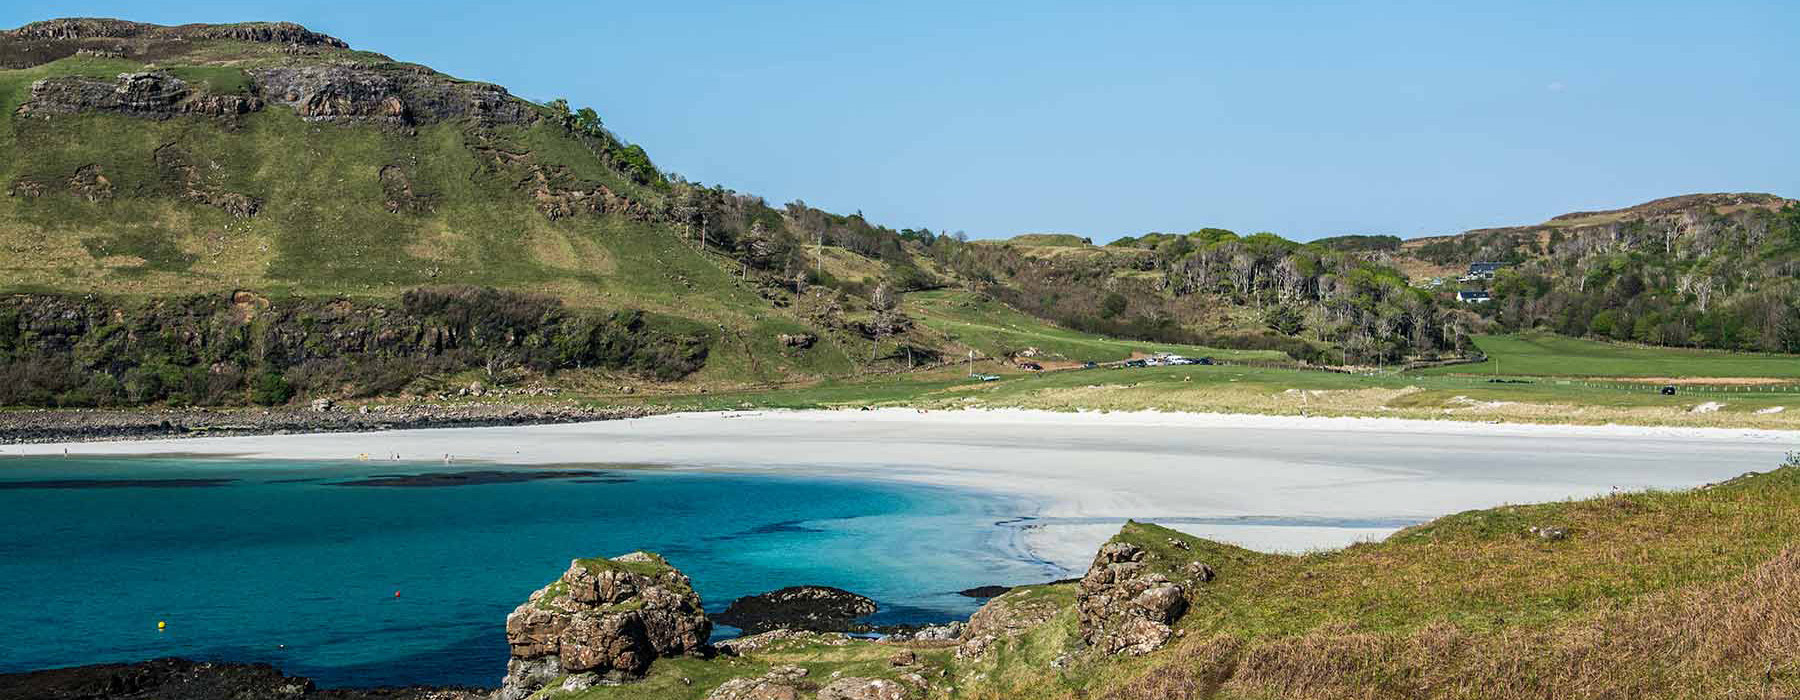 calgary-beach-header700